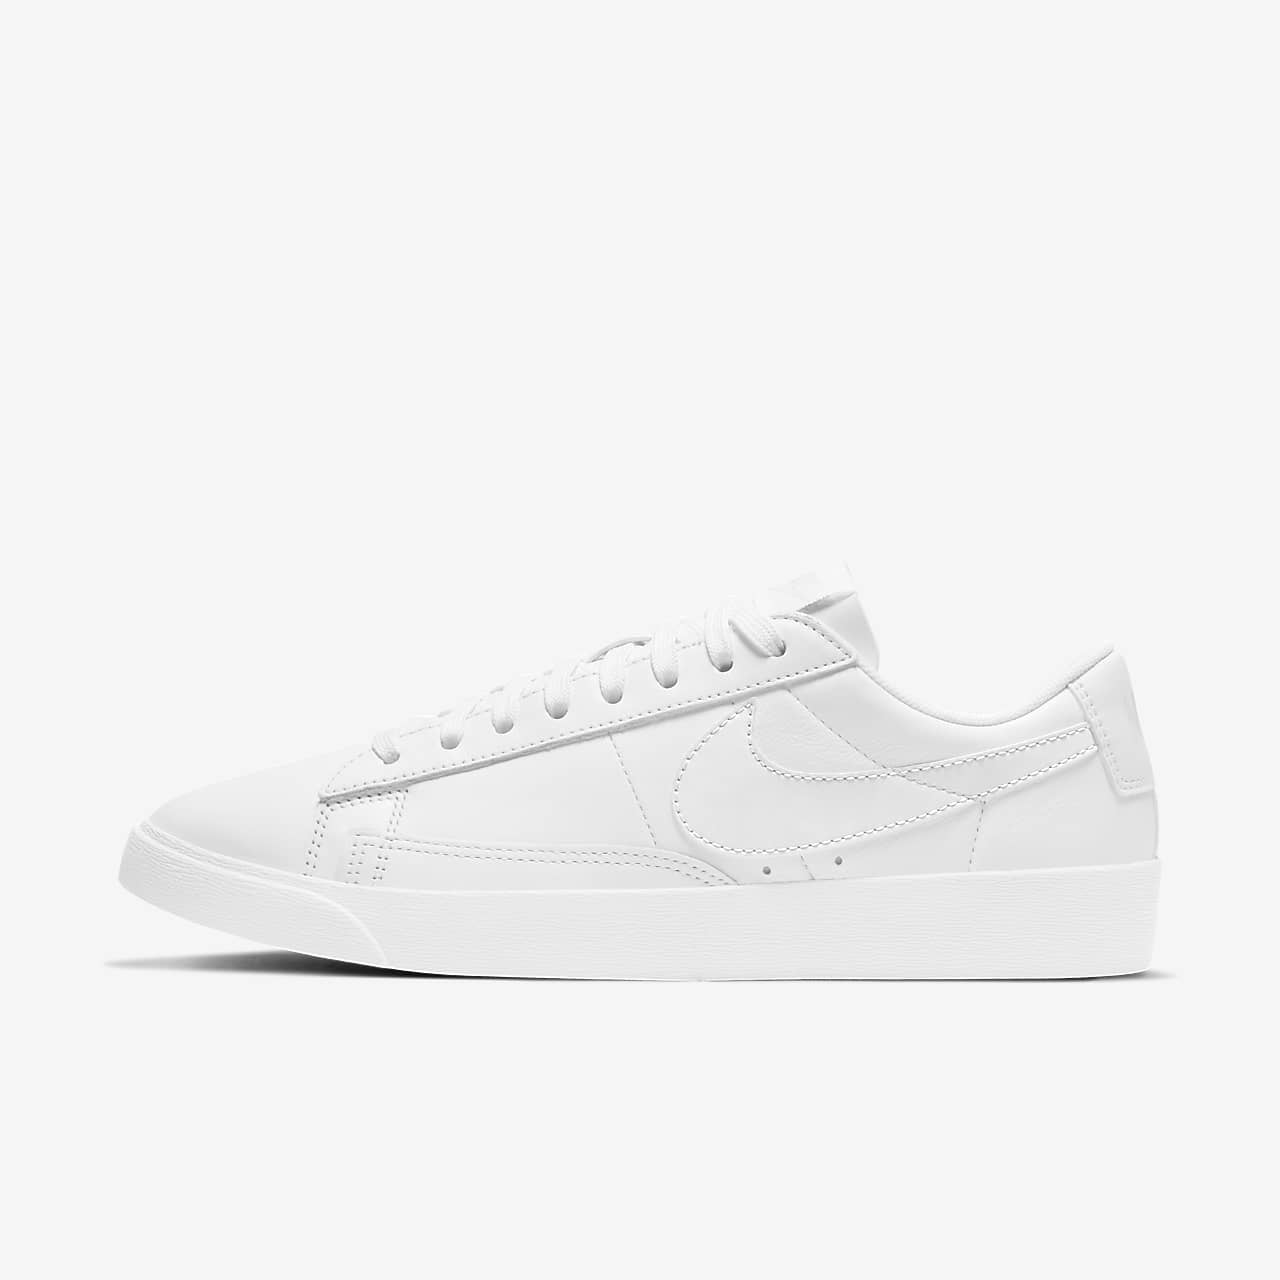 Nike Blazer Low LE Damenschuh